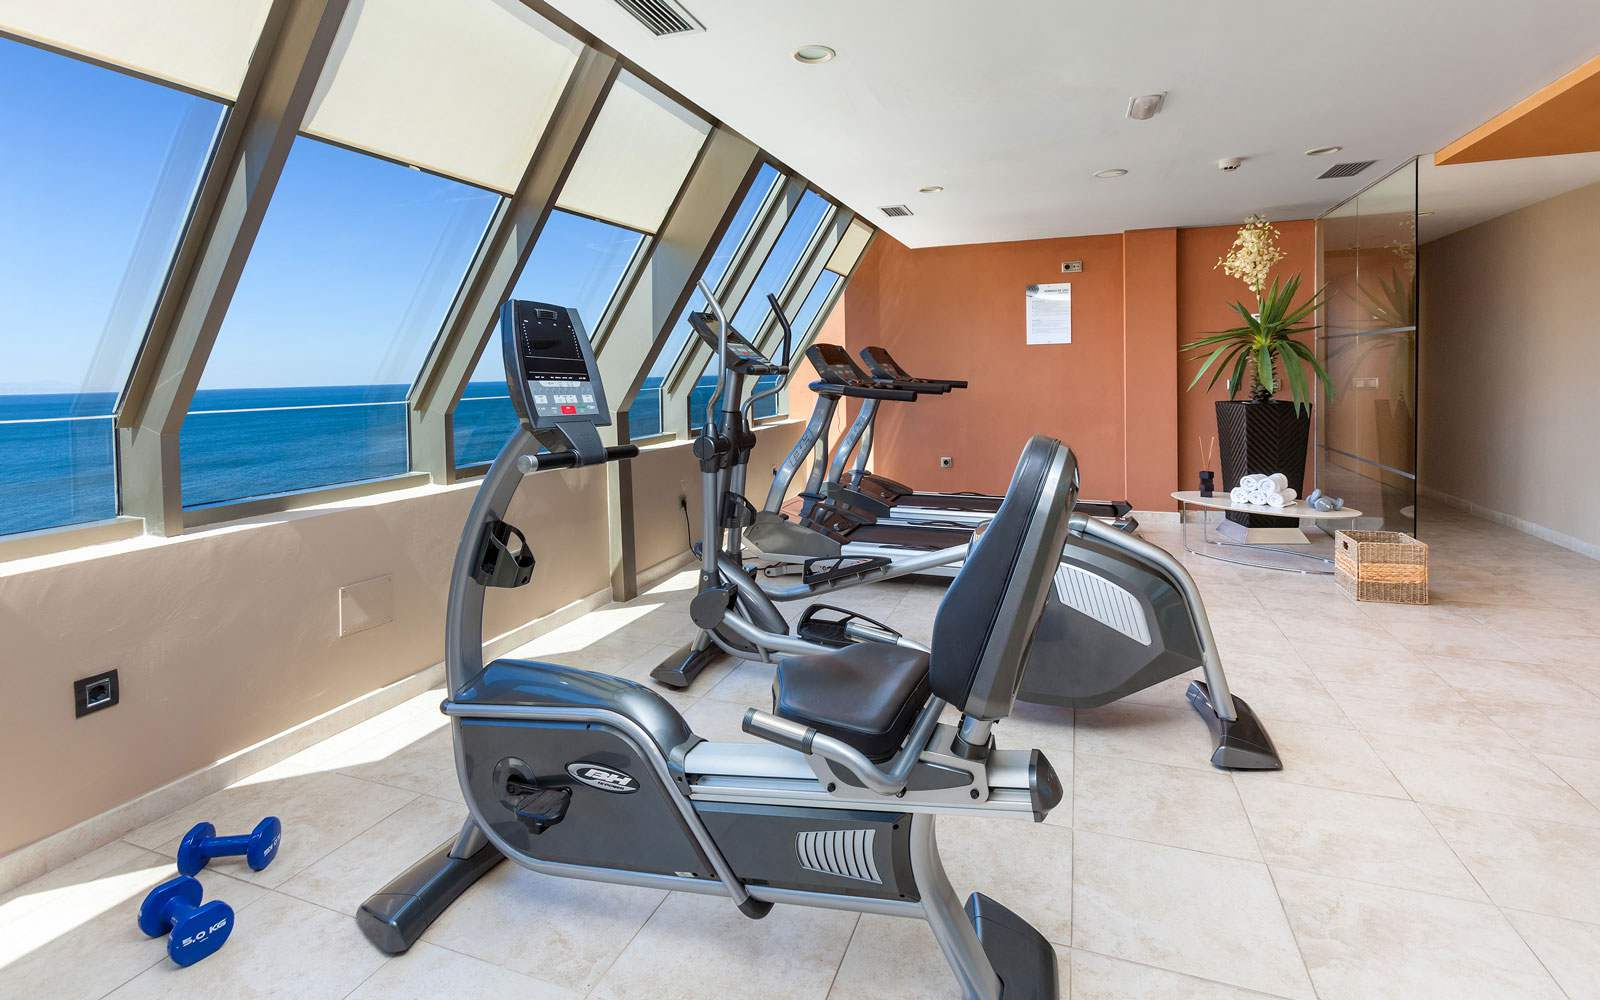 Sol Costa Atlantis fitness centre